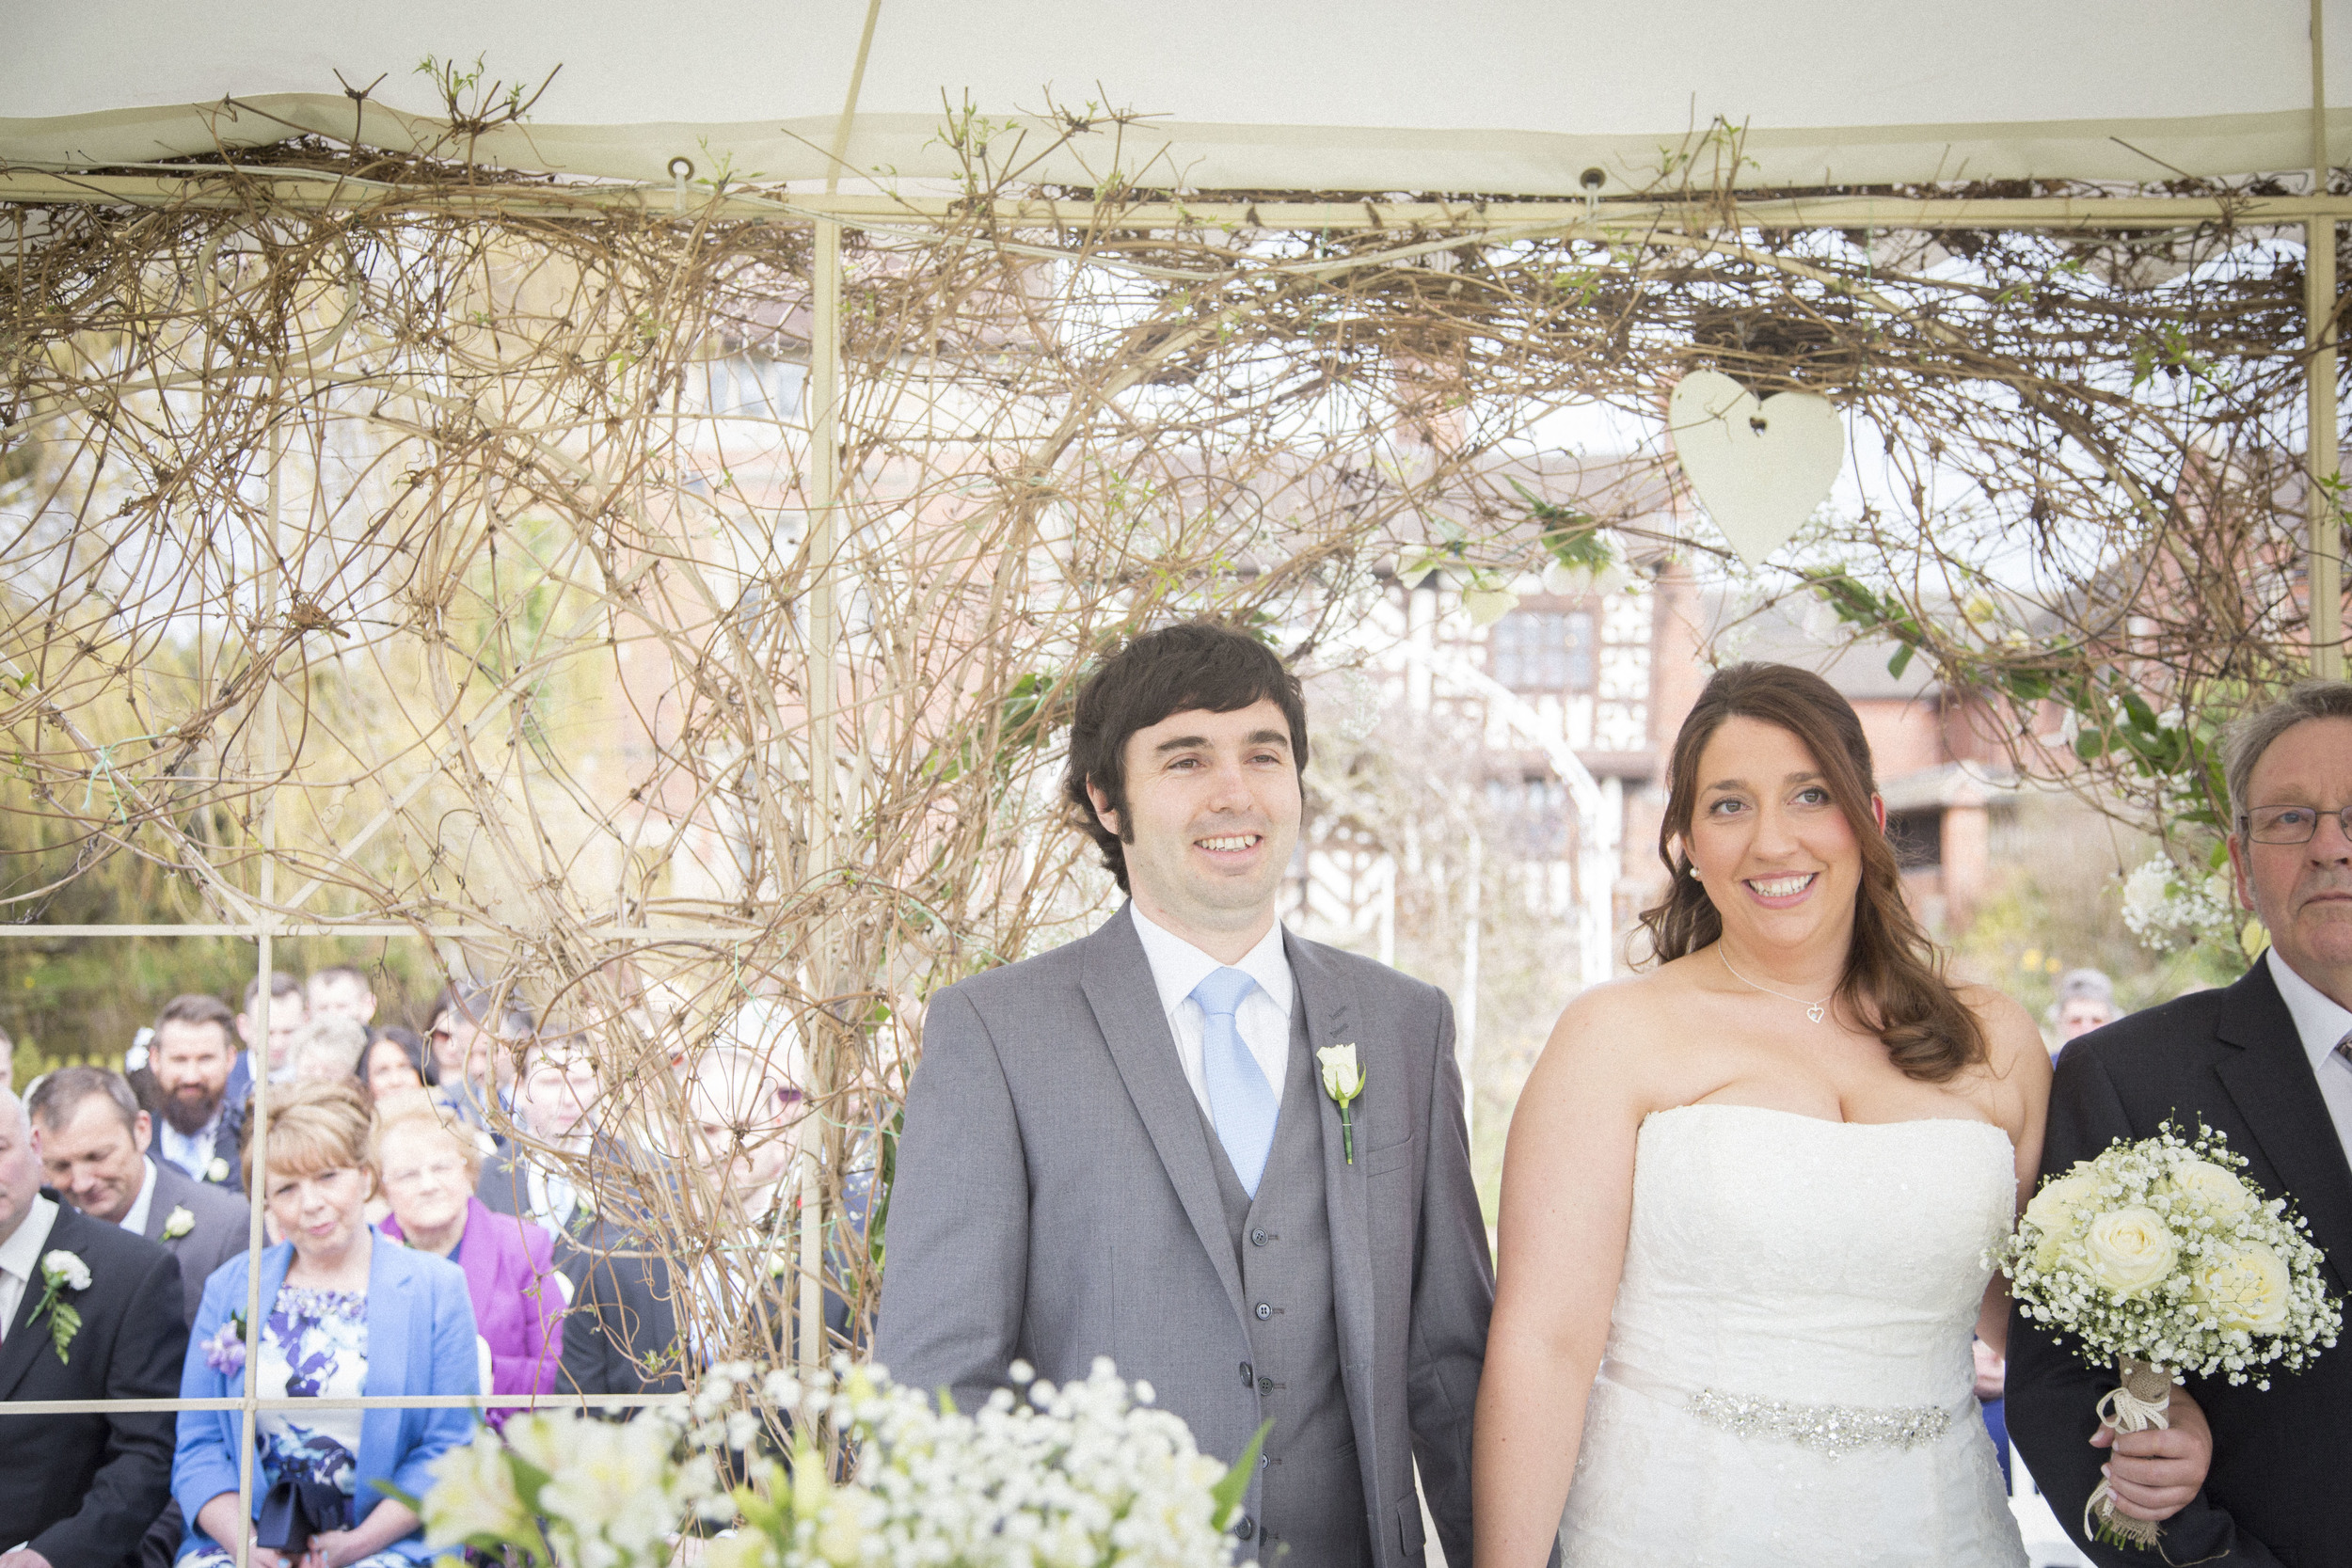 Ellie+Rob-Albright-Hussey-Wedding-106.jpg